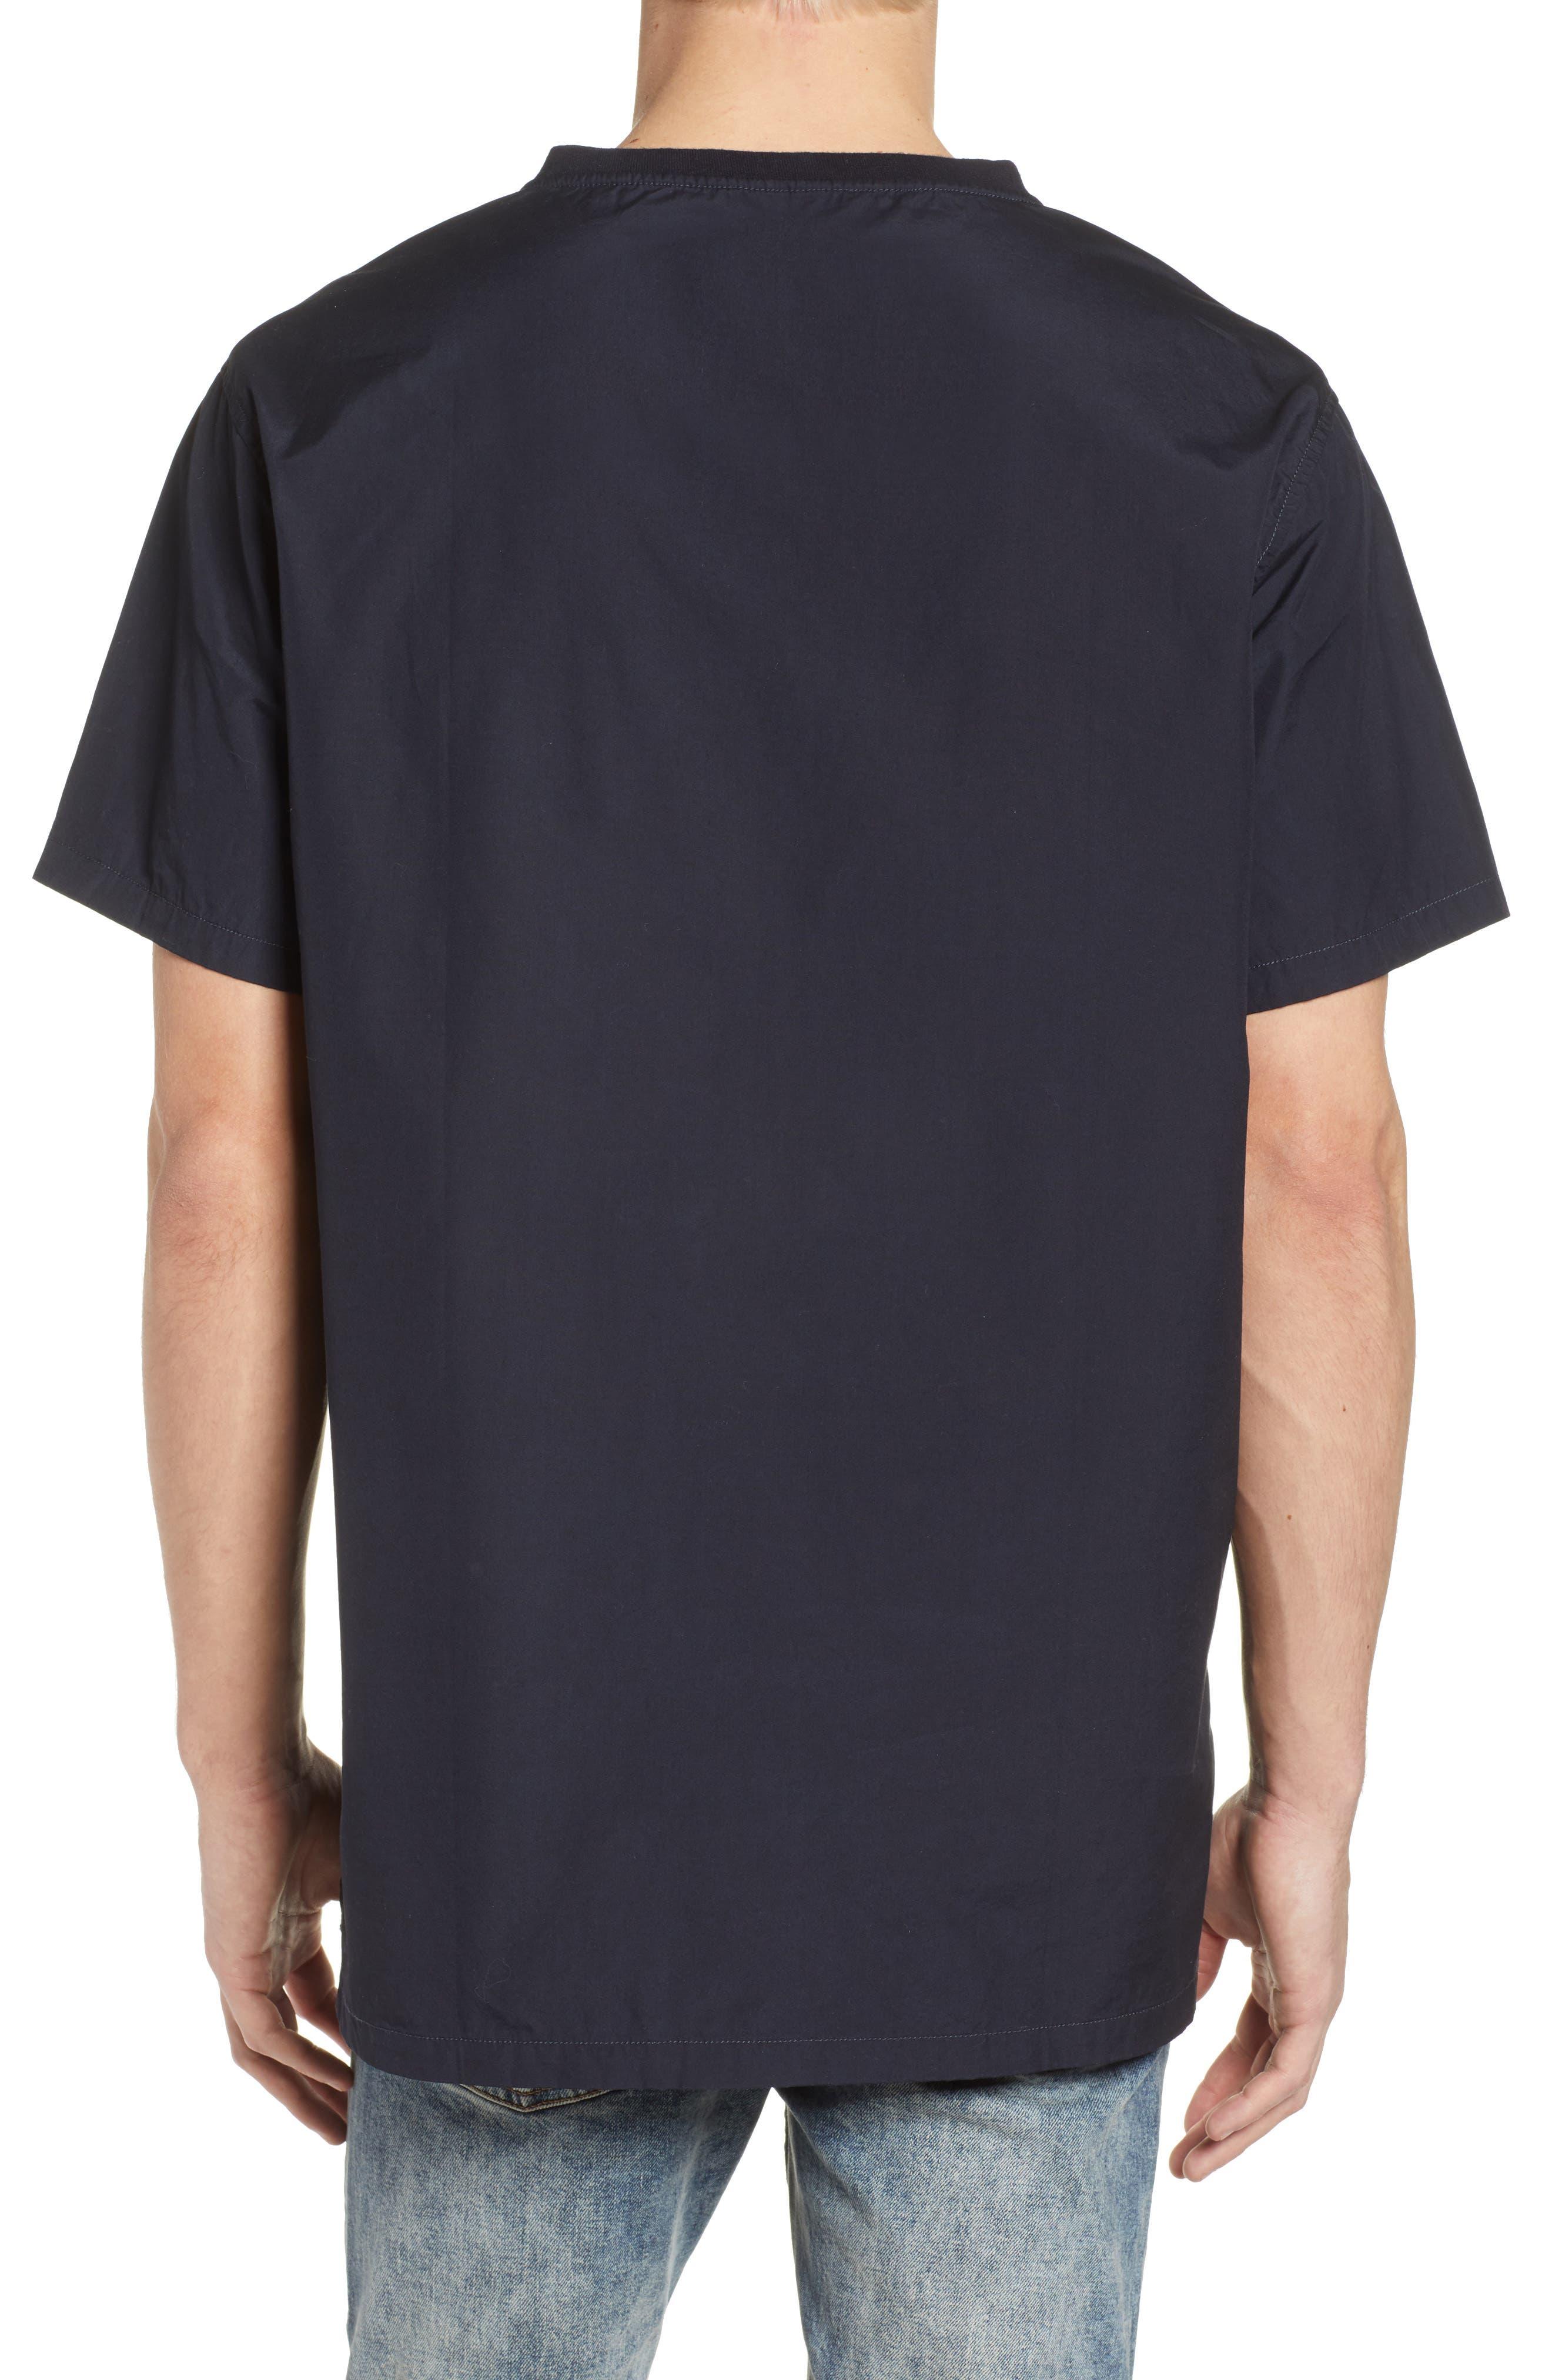 Woven T-Shirt,                             Alternate thumbnail 2, color,                             001